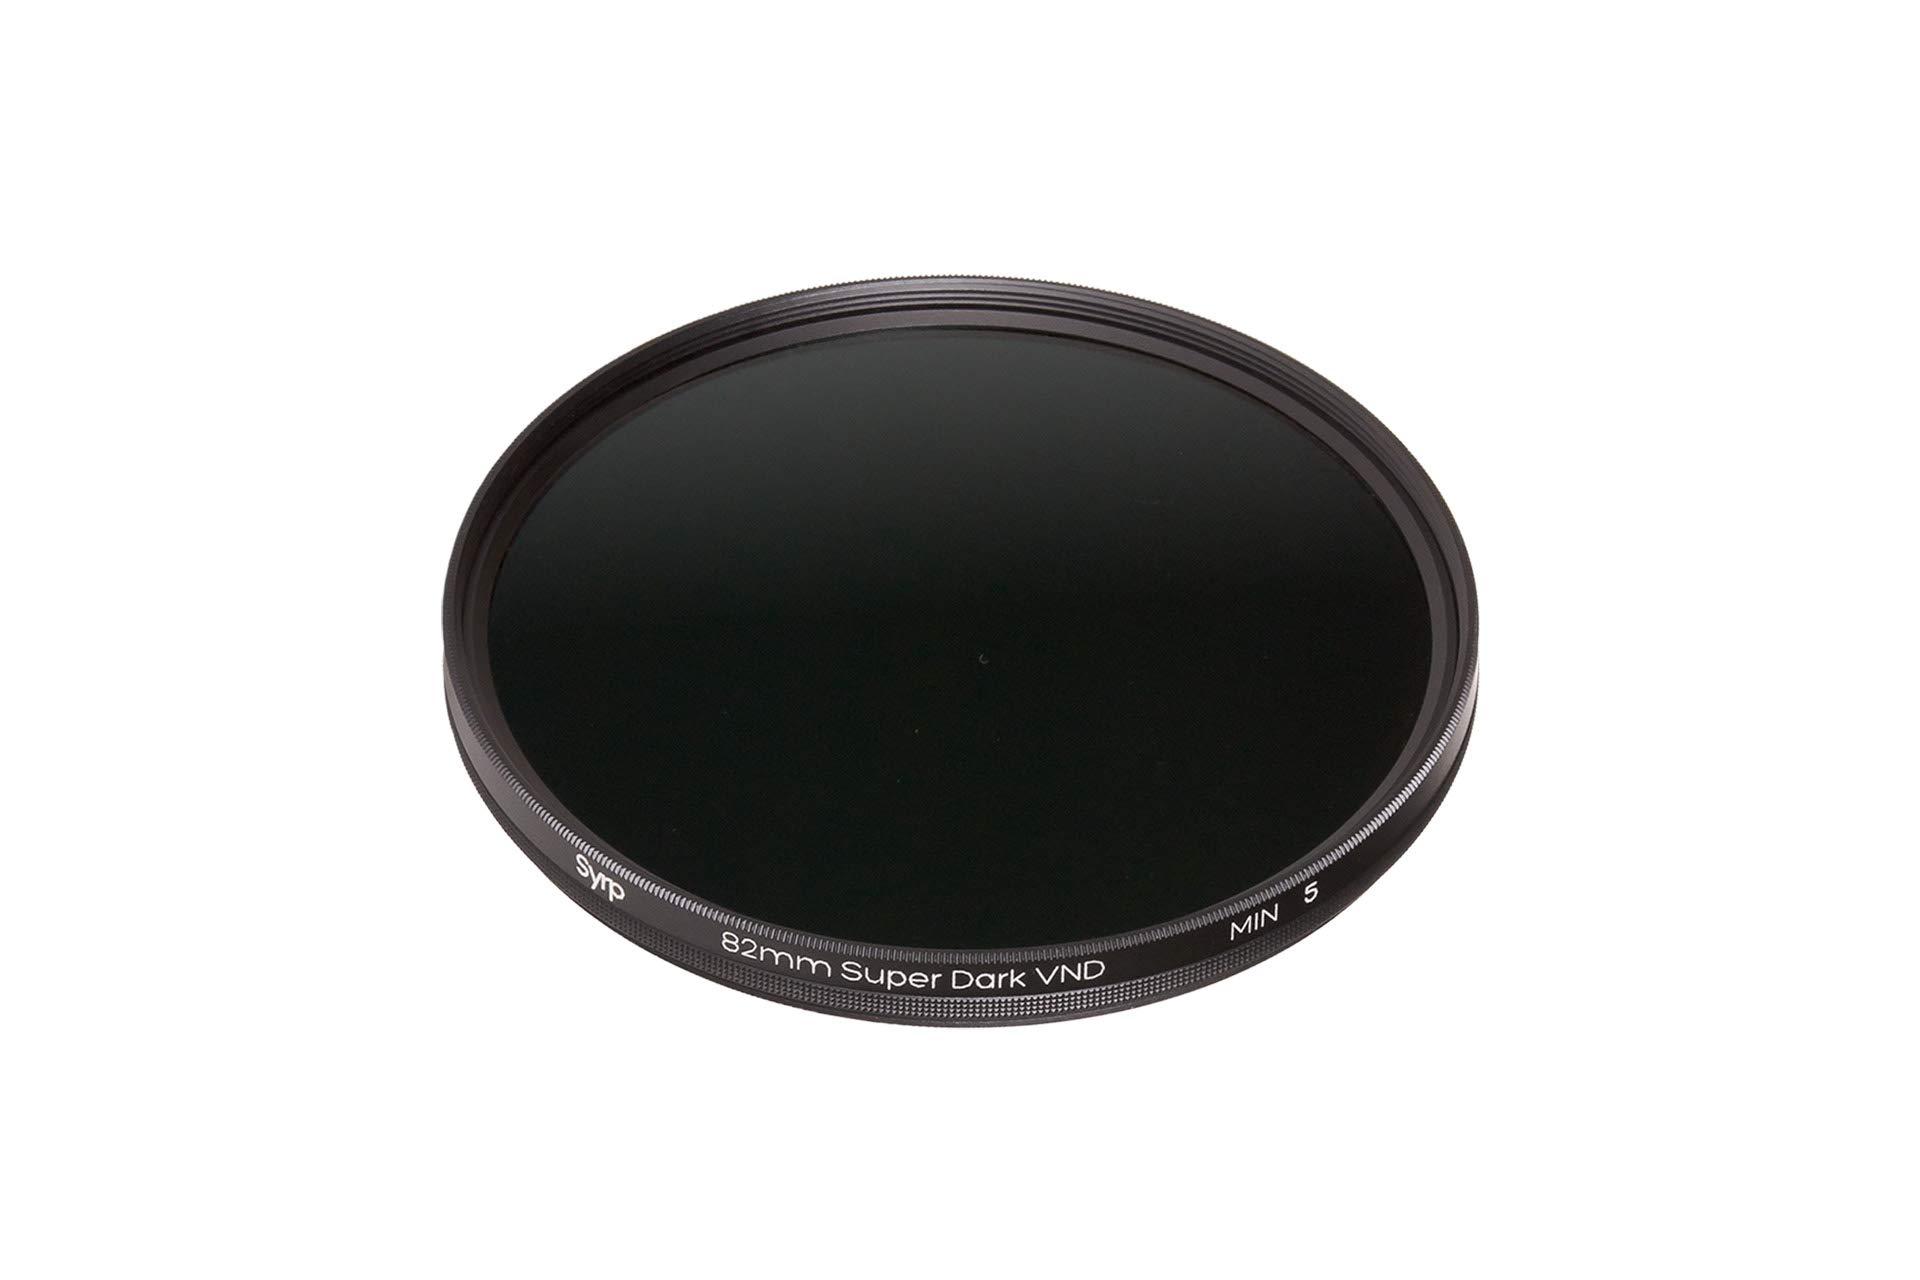 Syrp Large (82mm) Super Dark Variable ND Filter